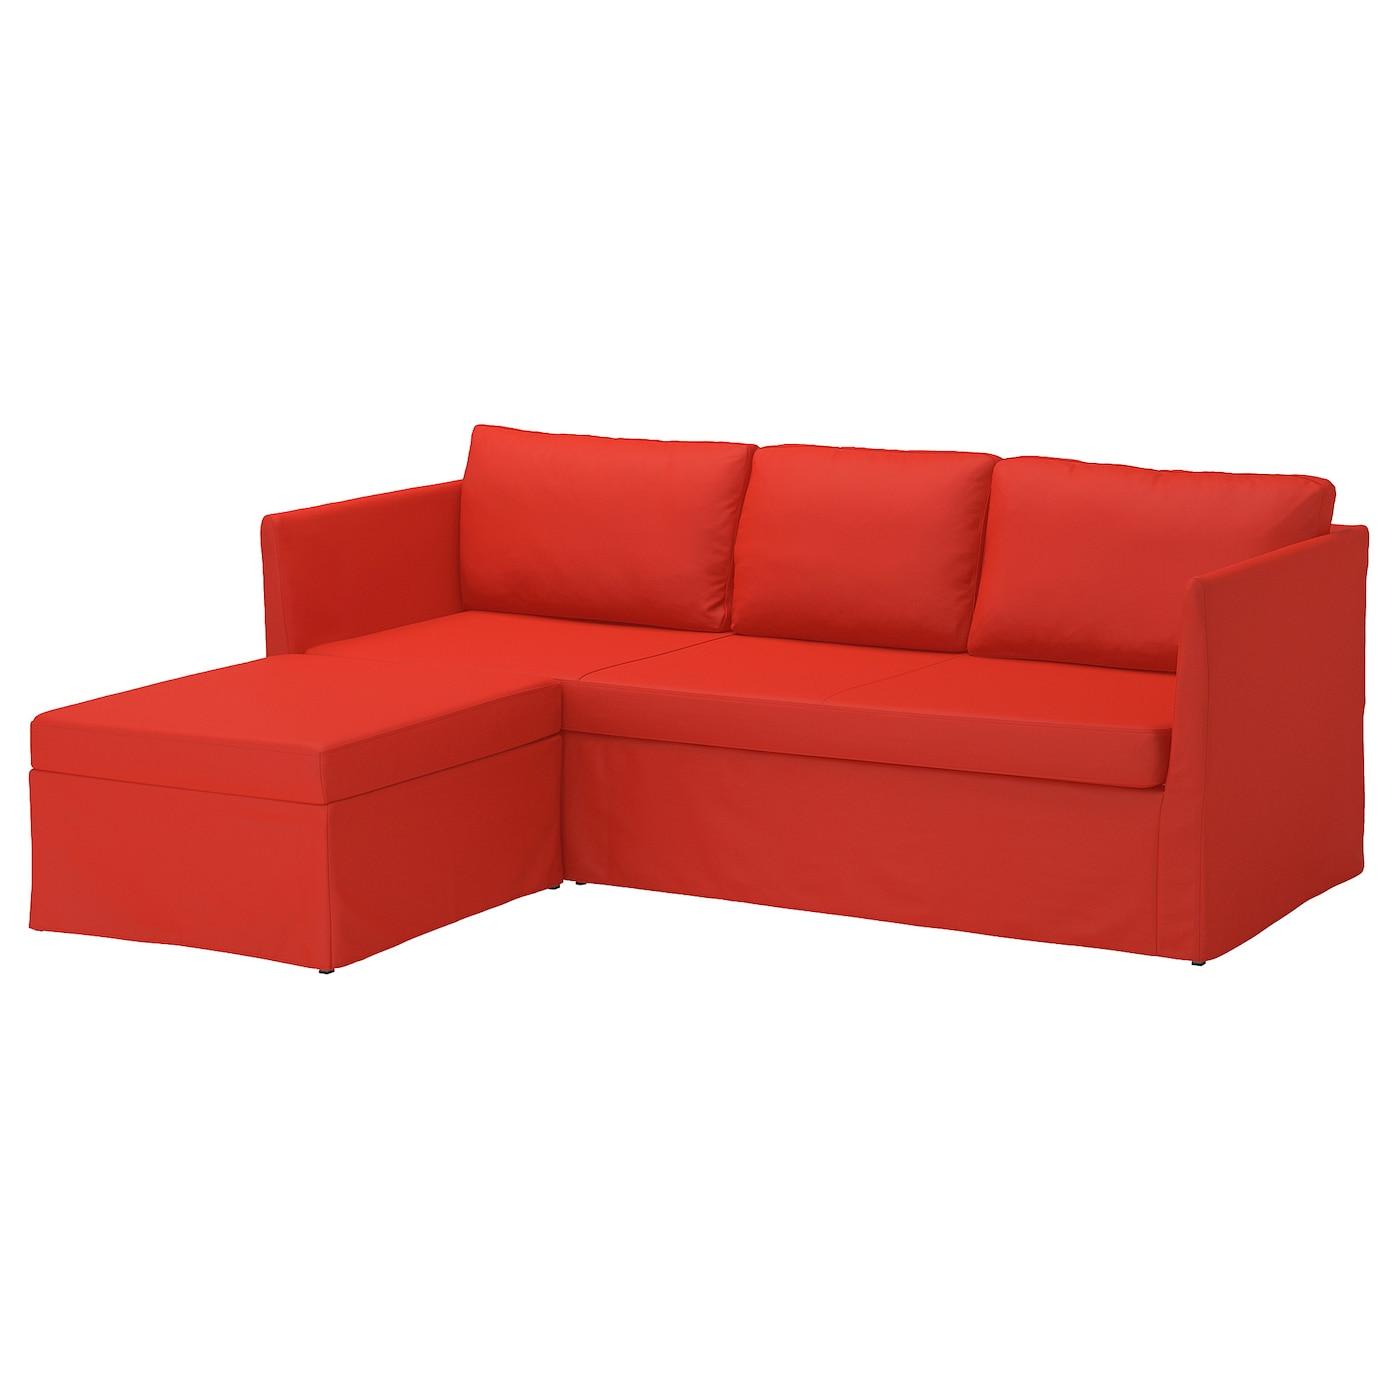 Brathult Corner Sofa Bed Vissle Red Orange Ikea